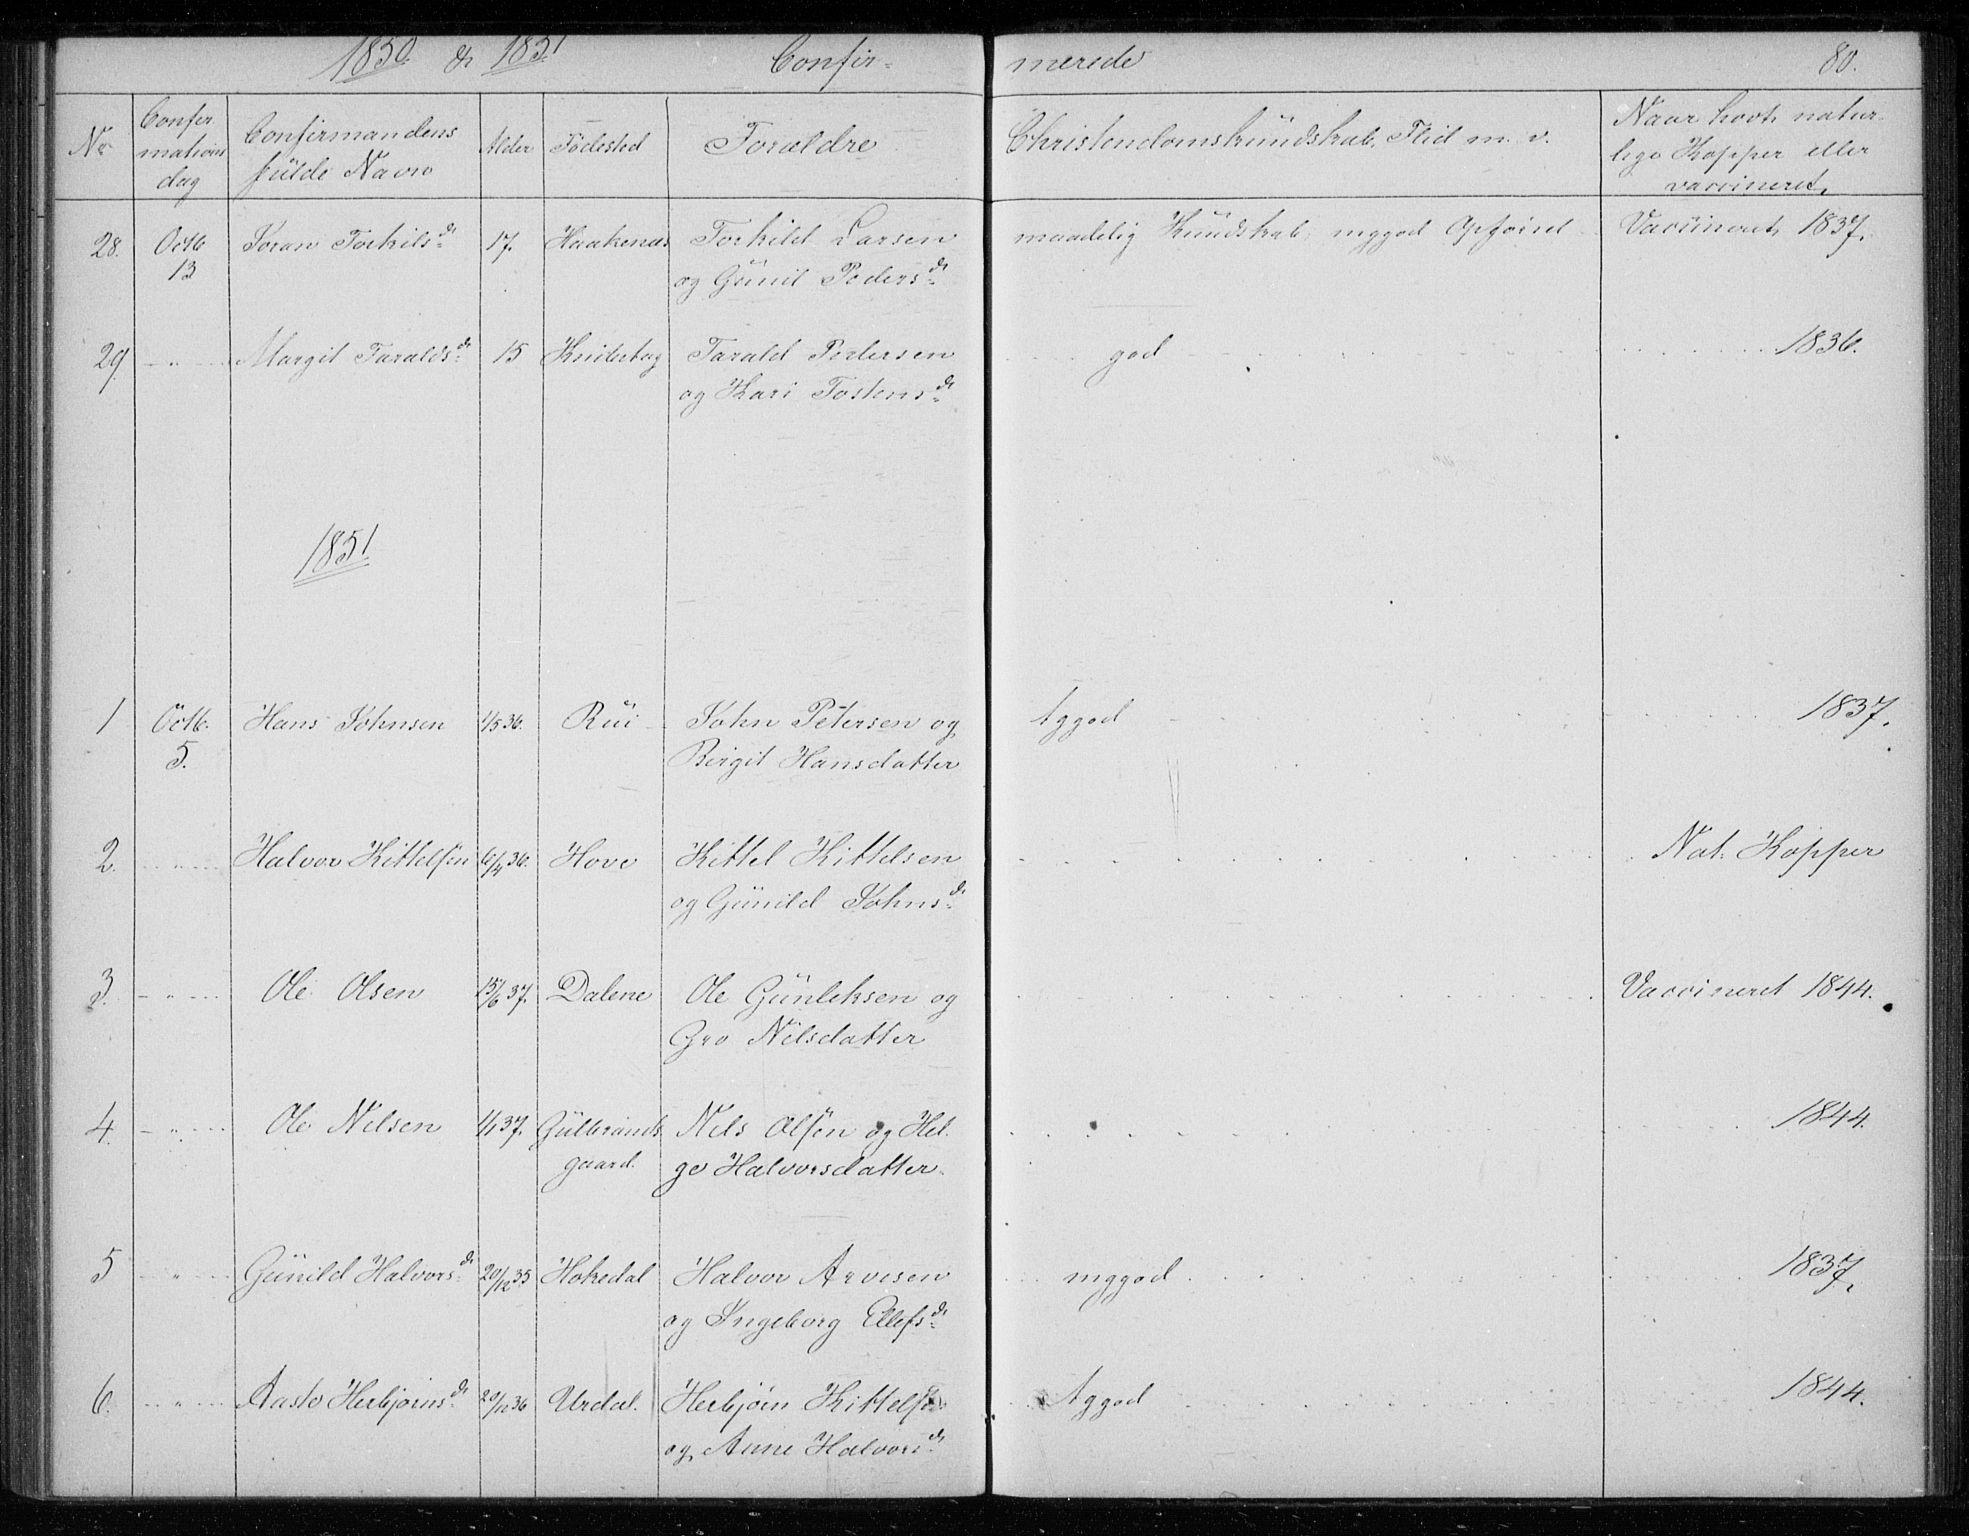 SAKO, Gransherad kirkebøker, F/Fb/L0003: Ministerialbok nr. II 3, 1844-1859, s. 80